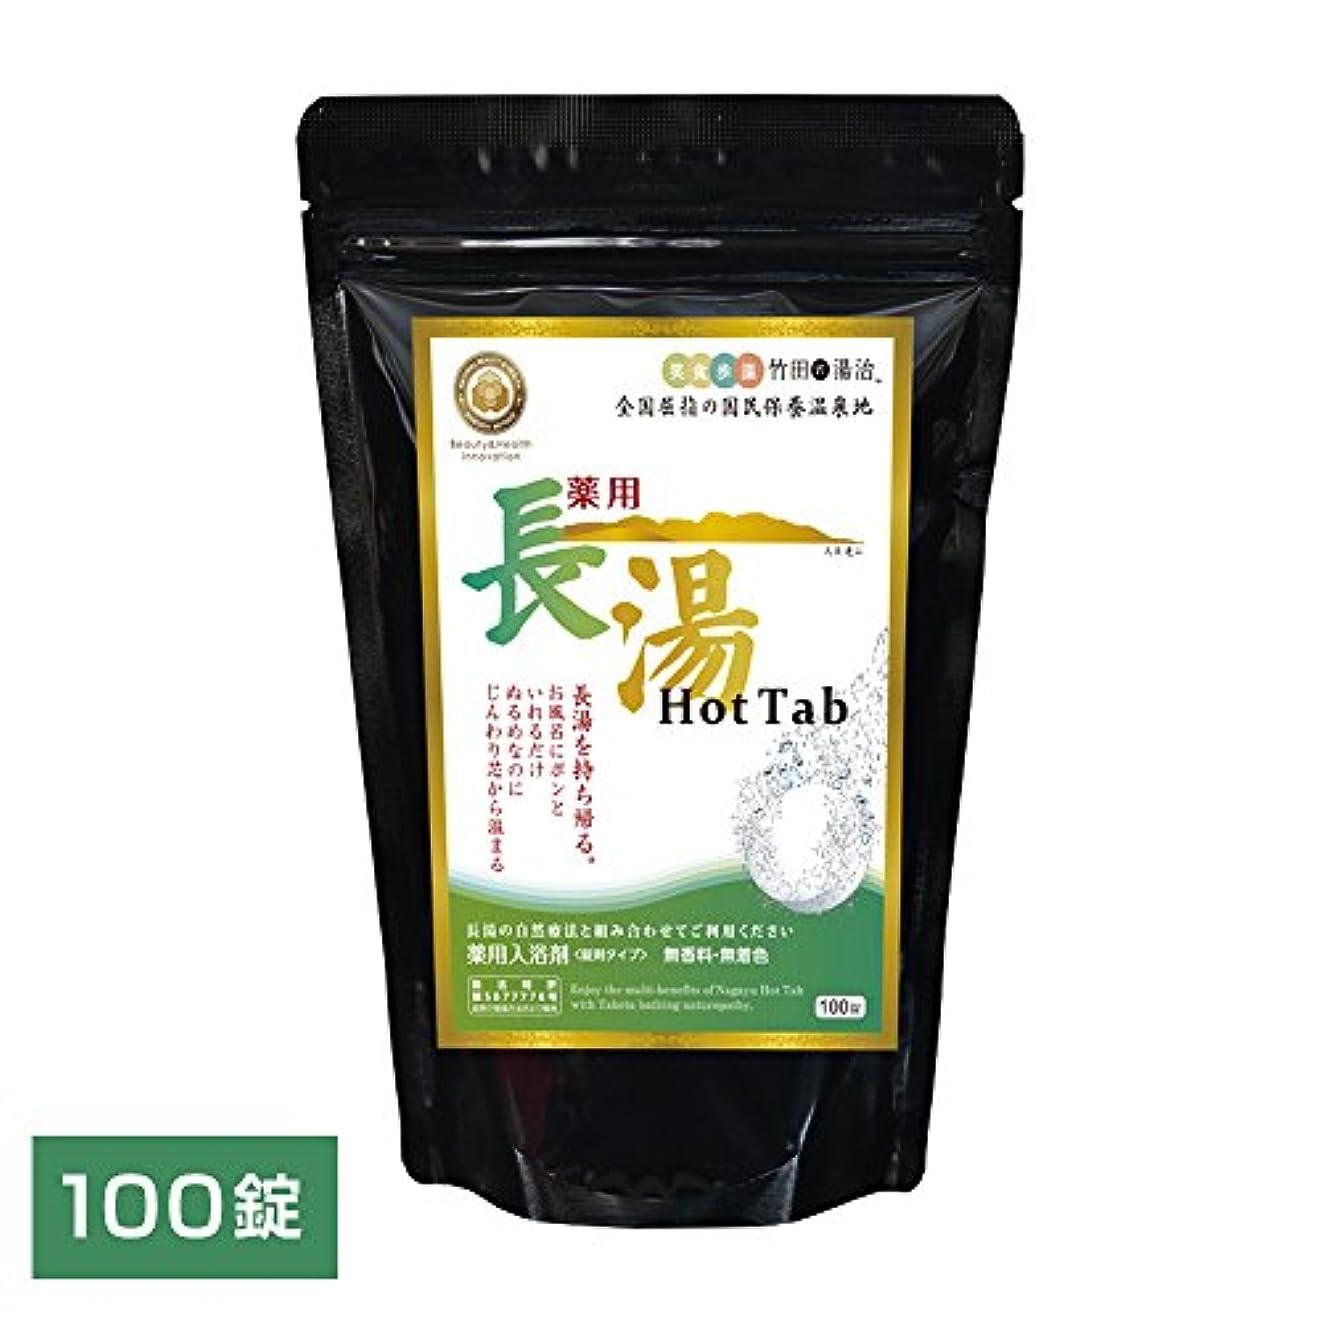 Hot Tab 重炭酸入浴剤 (医薬部外品) 薬用長湯ホットタブ (皮脂汚れを重炭酸の力で除去 美容健康入浴剤 炭酸泉タブレット) 100錠